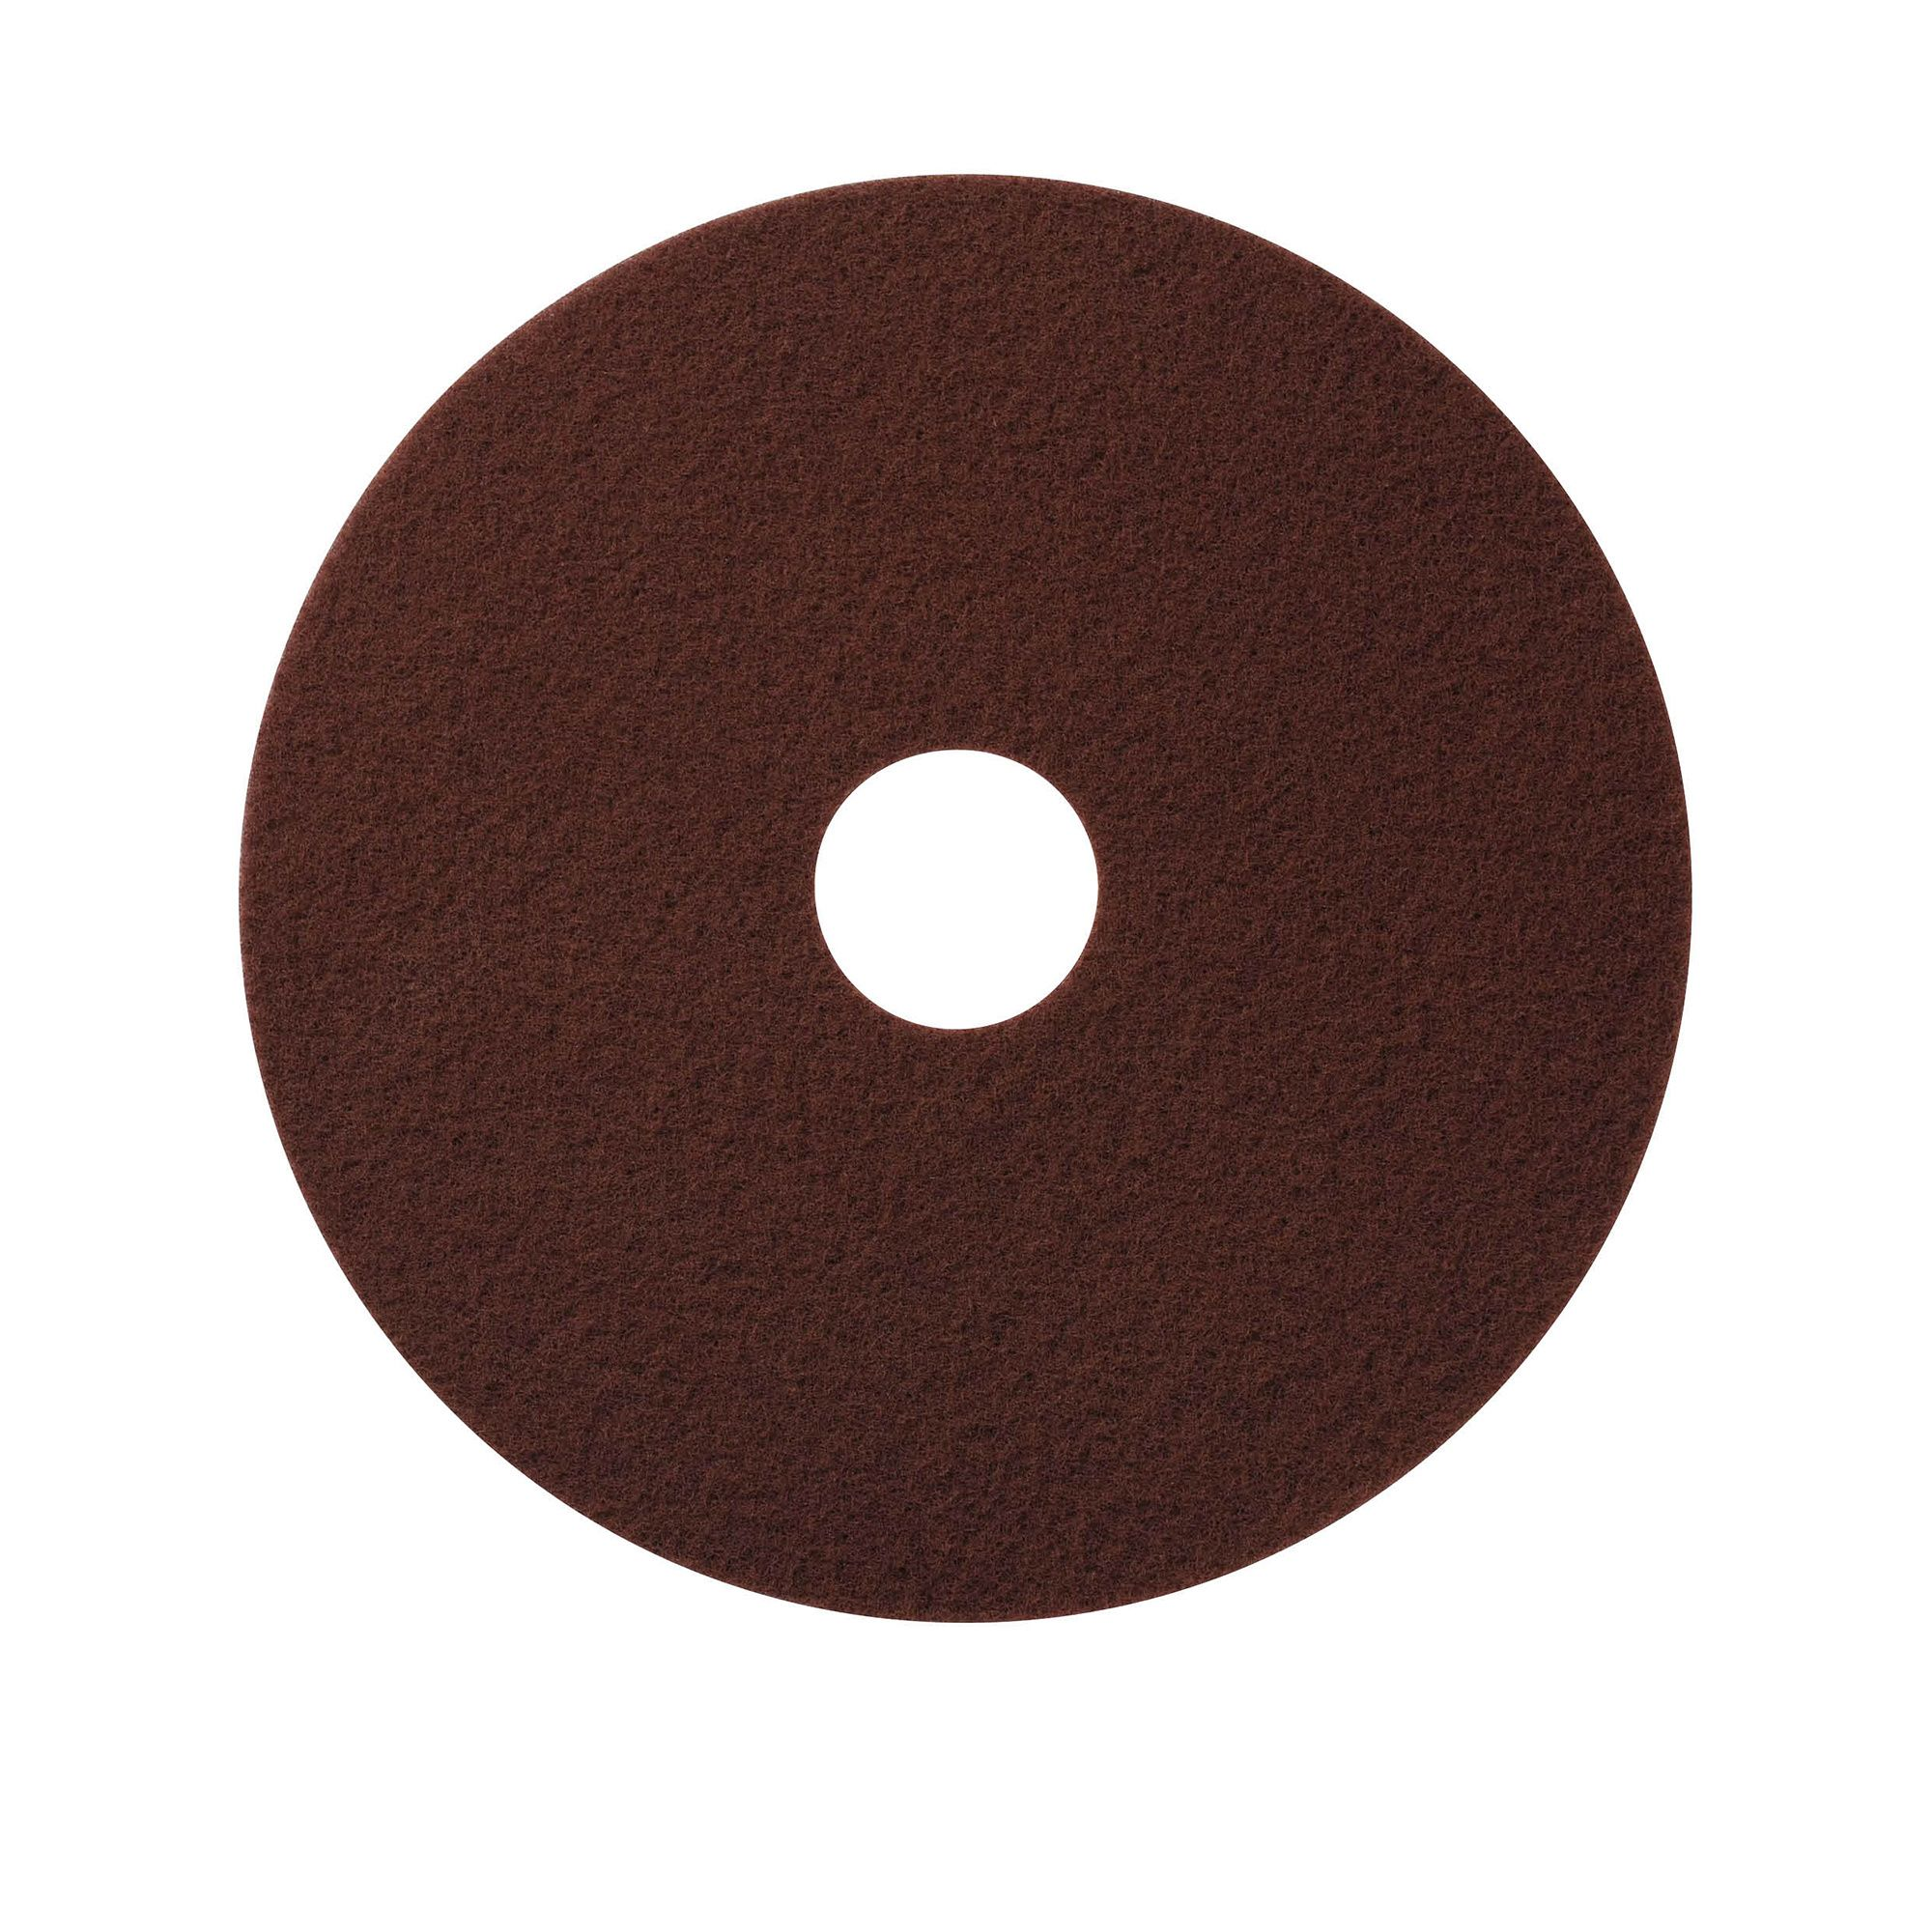 NuPad bruin (strippen zonder chemie), per 10 stuks, 14 inch / 355 mm